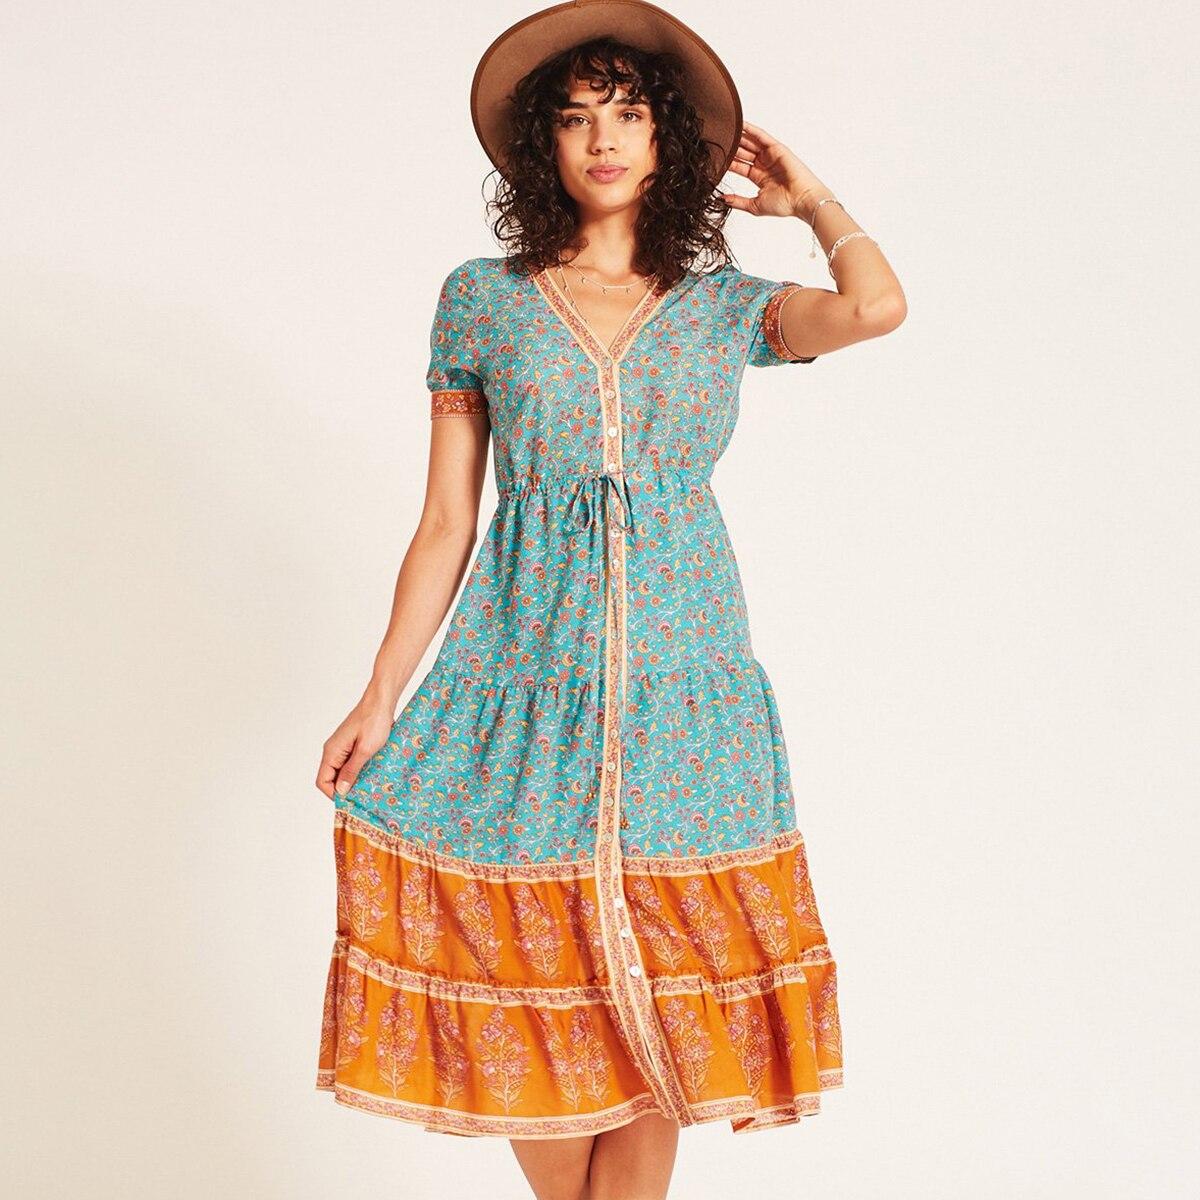 1197e518d98ce 2018 Summer Ladies Long Dress Gypsy Wisteria Floral Print Boho Midi Dress  Women V neck Single-Breasted Button Short Sleeve Dress